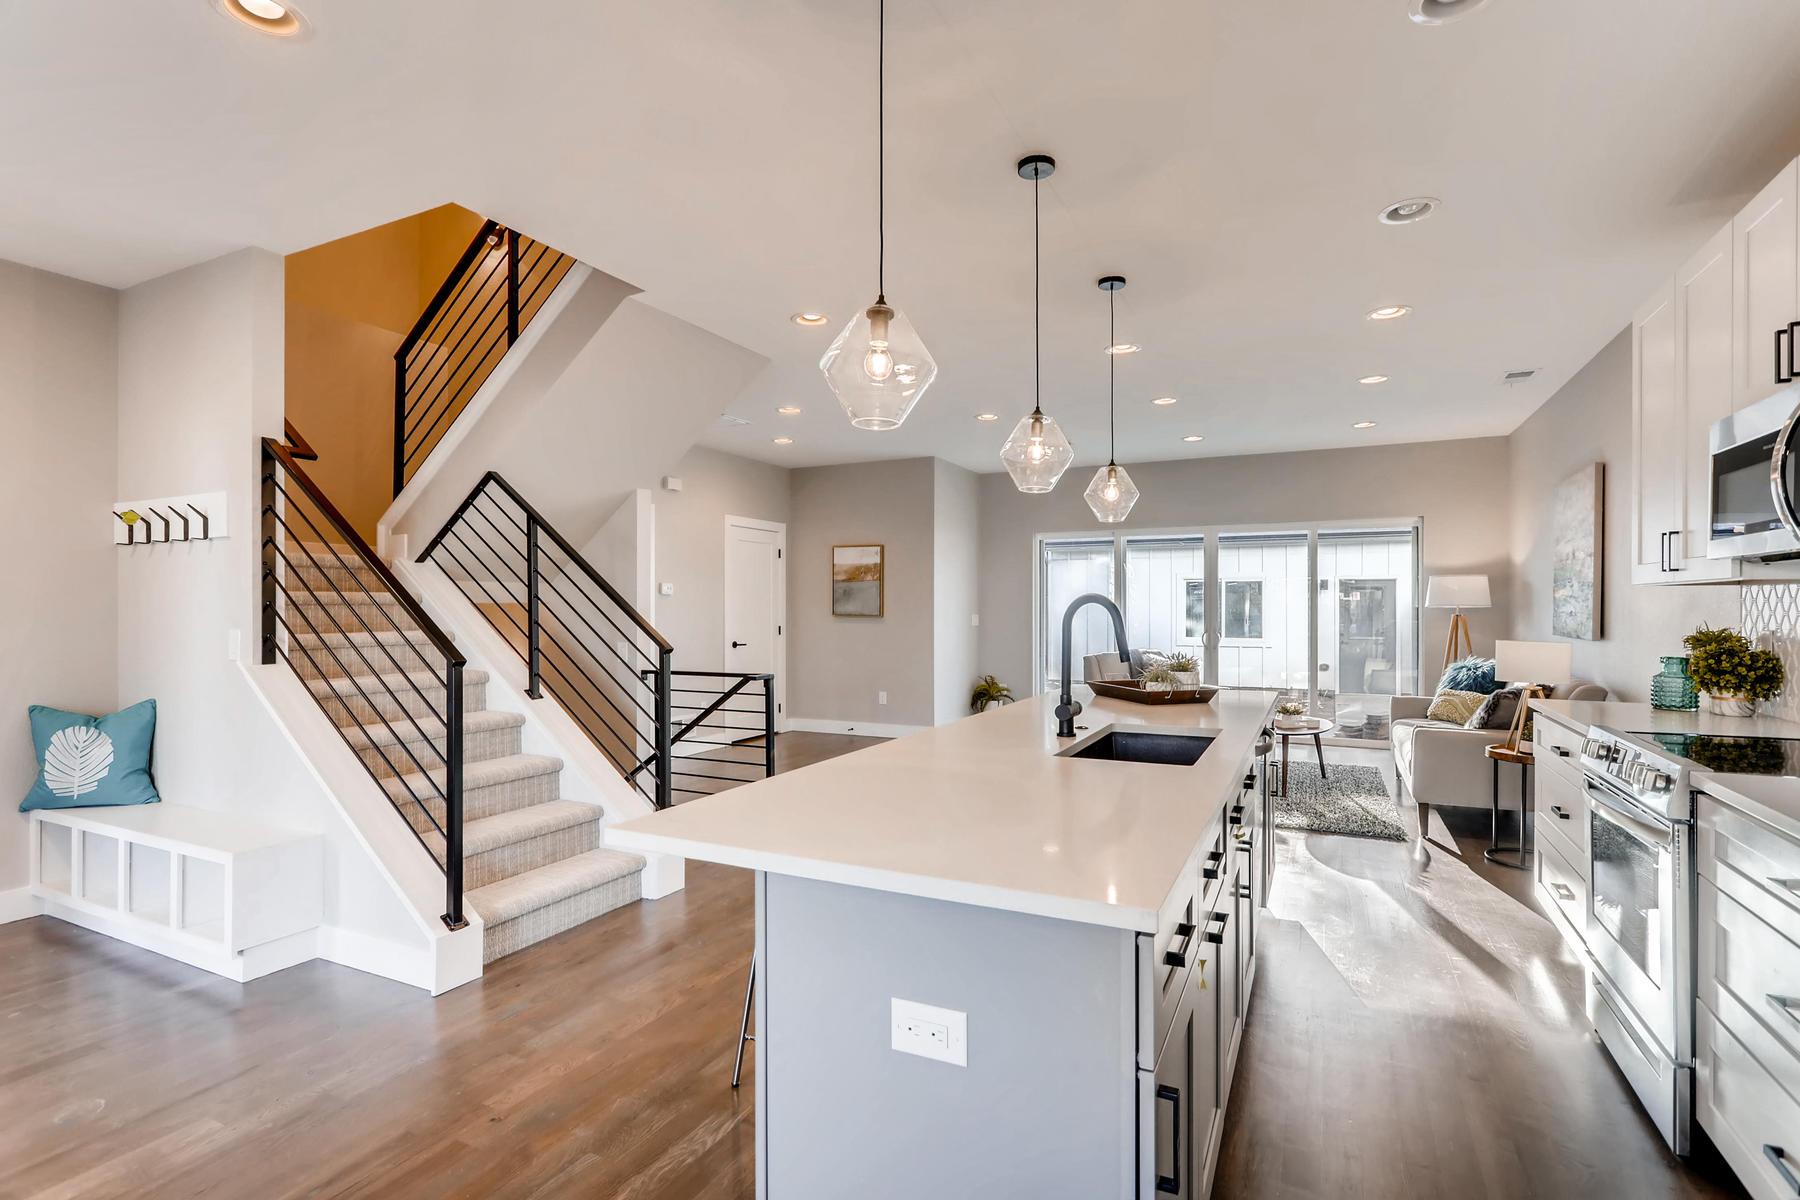 3105 S Cherokee St Englewood-012-25-Kitchen-MLS_Size.jpg